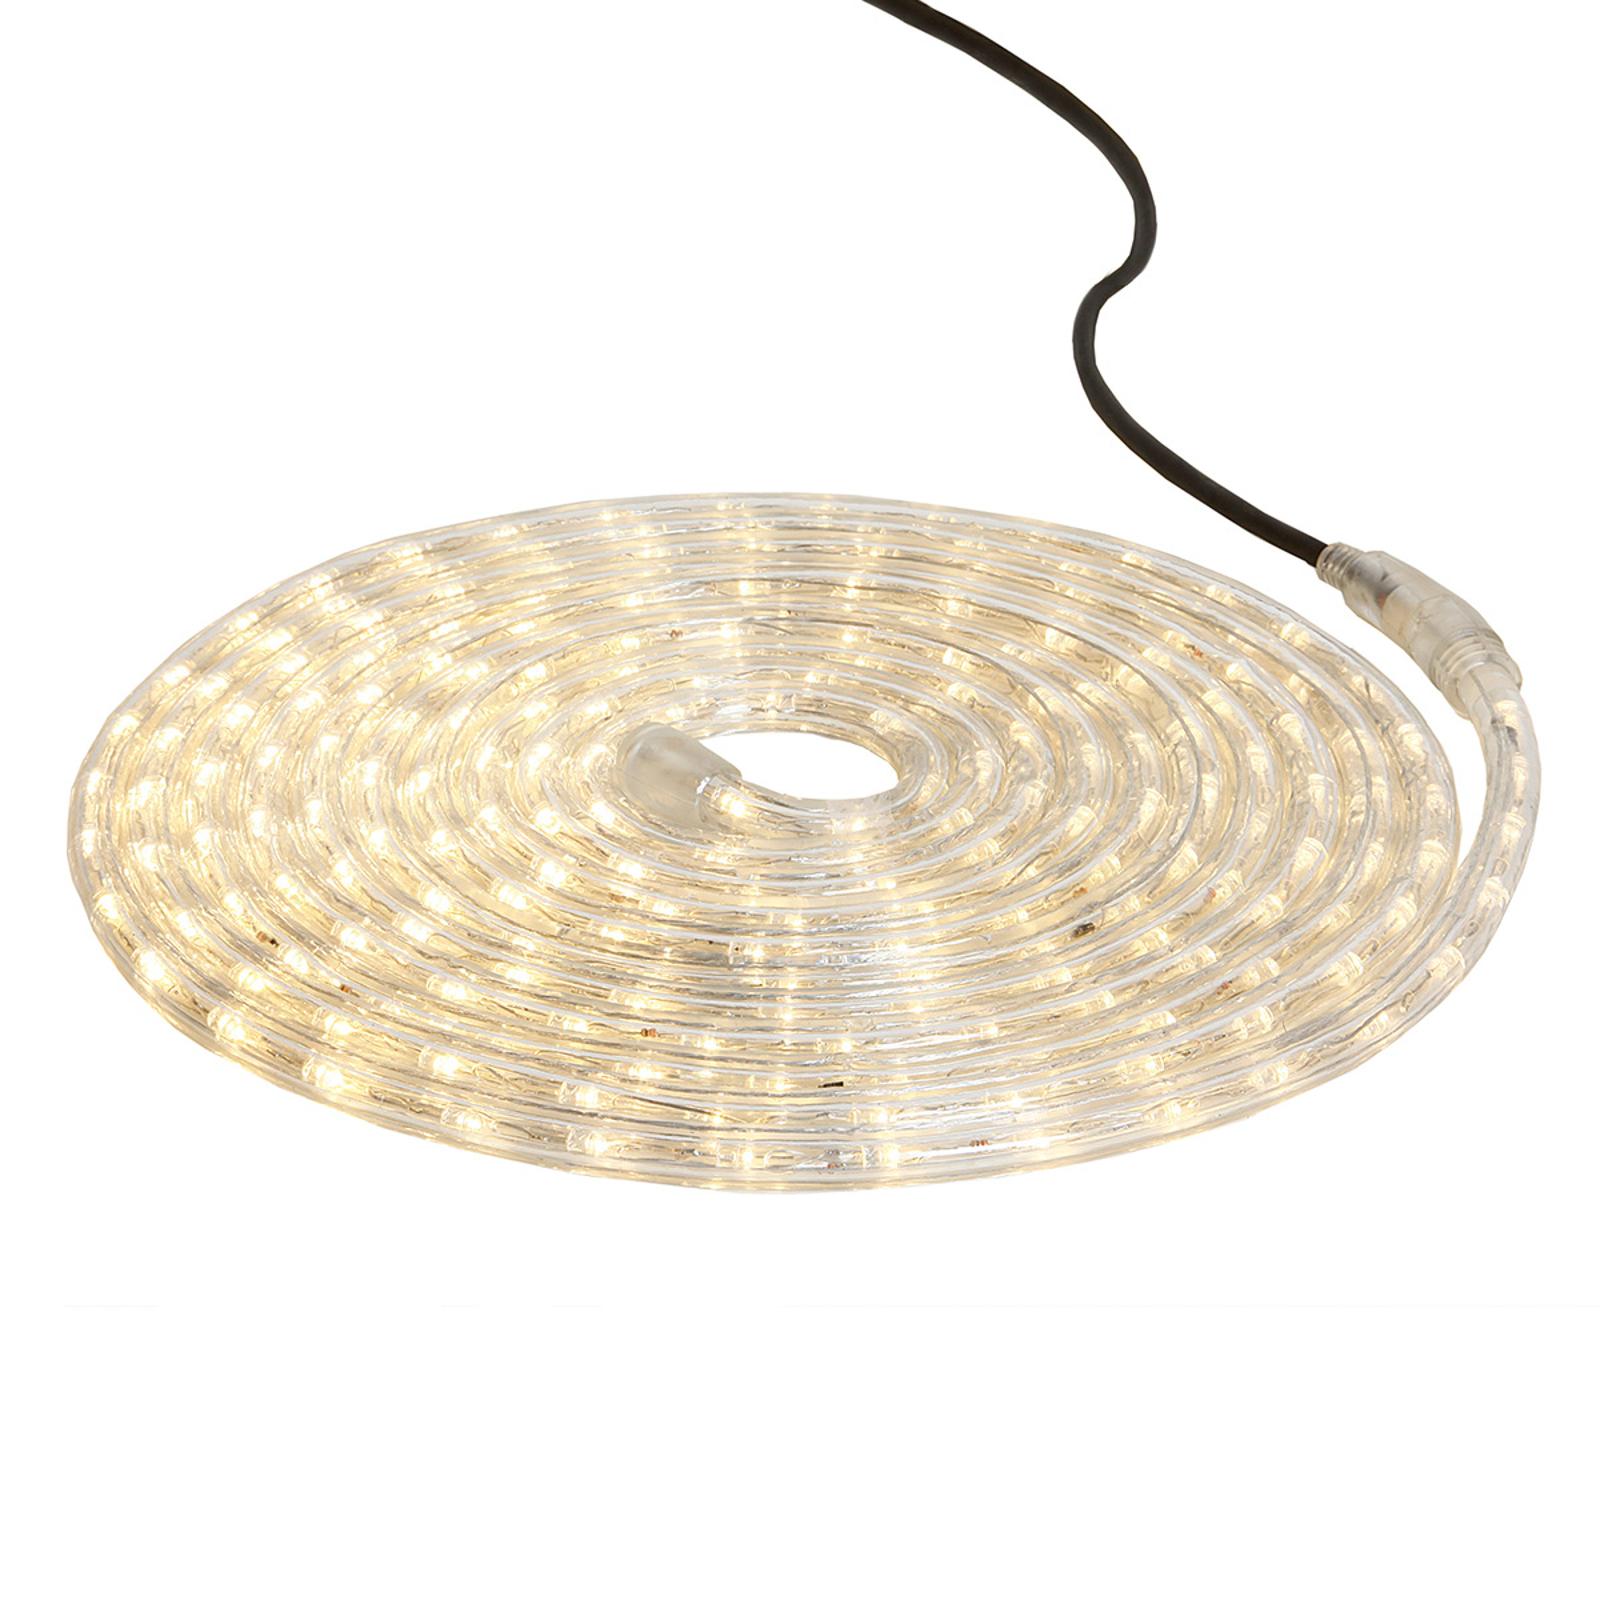 Svetelná LED hadica Ropelight Flex 6m teplá biela_1522640_1